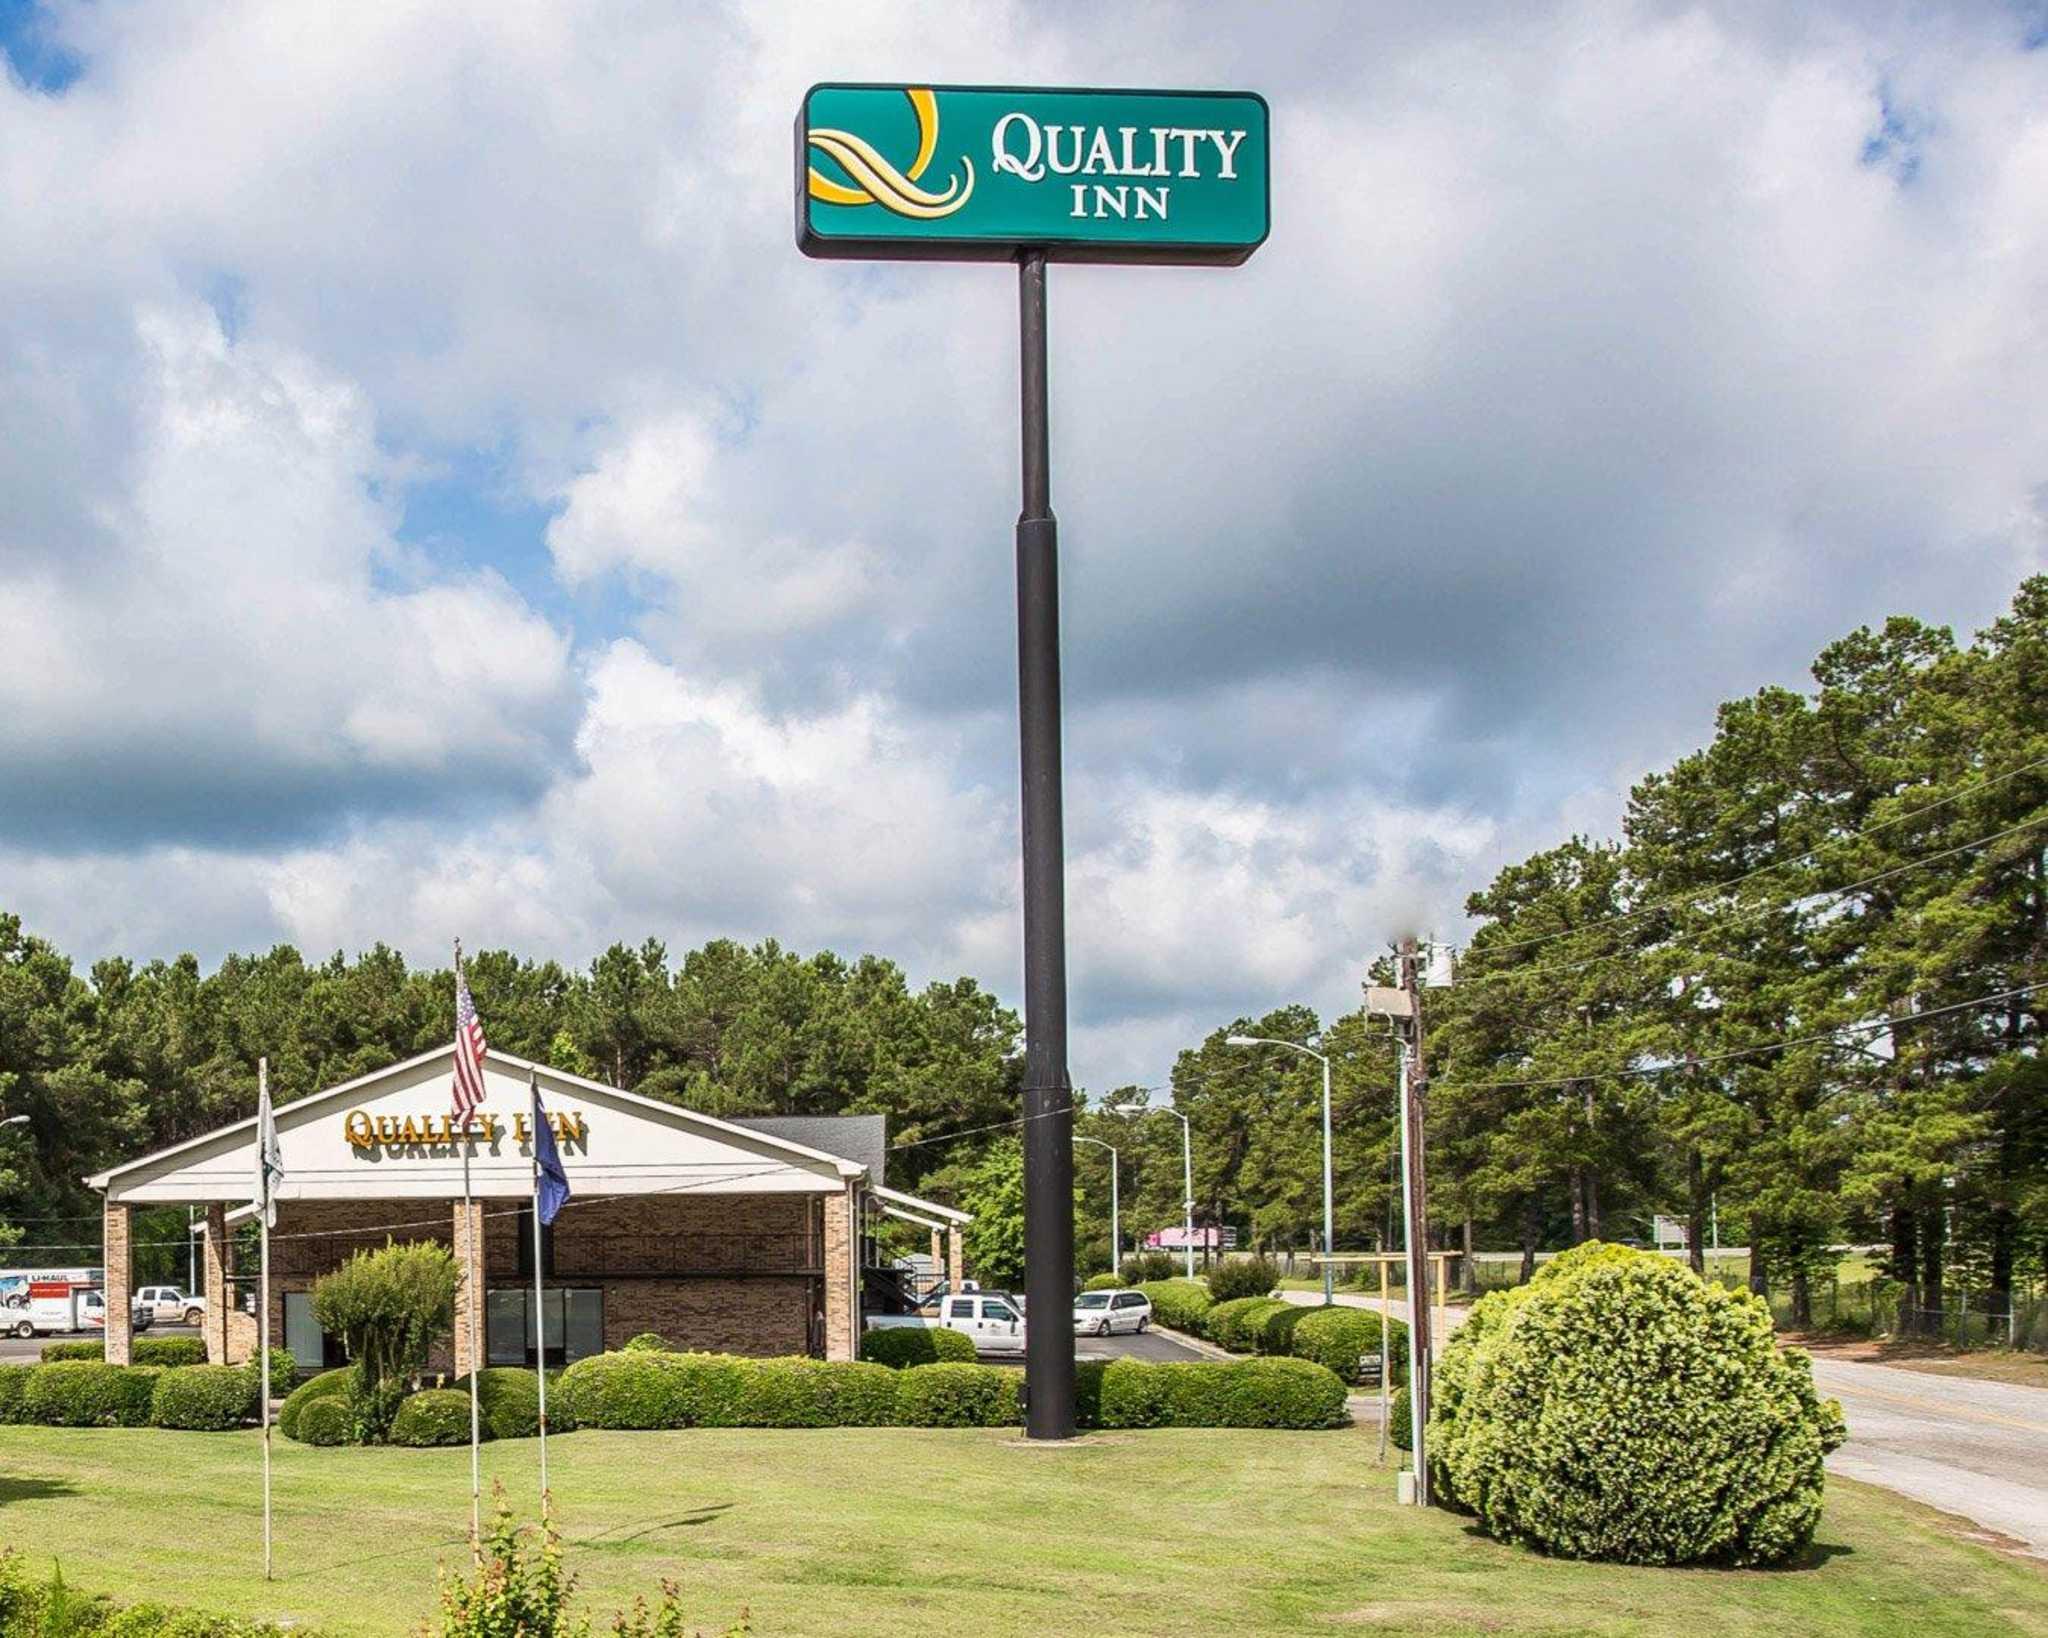 Quality Inn image 1